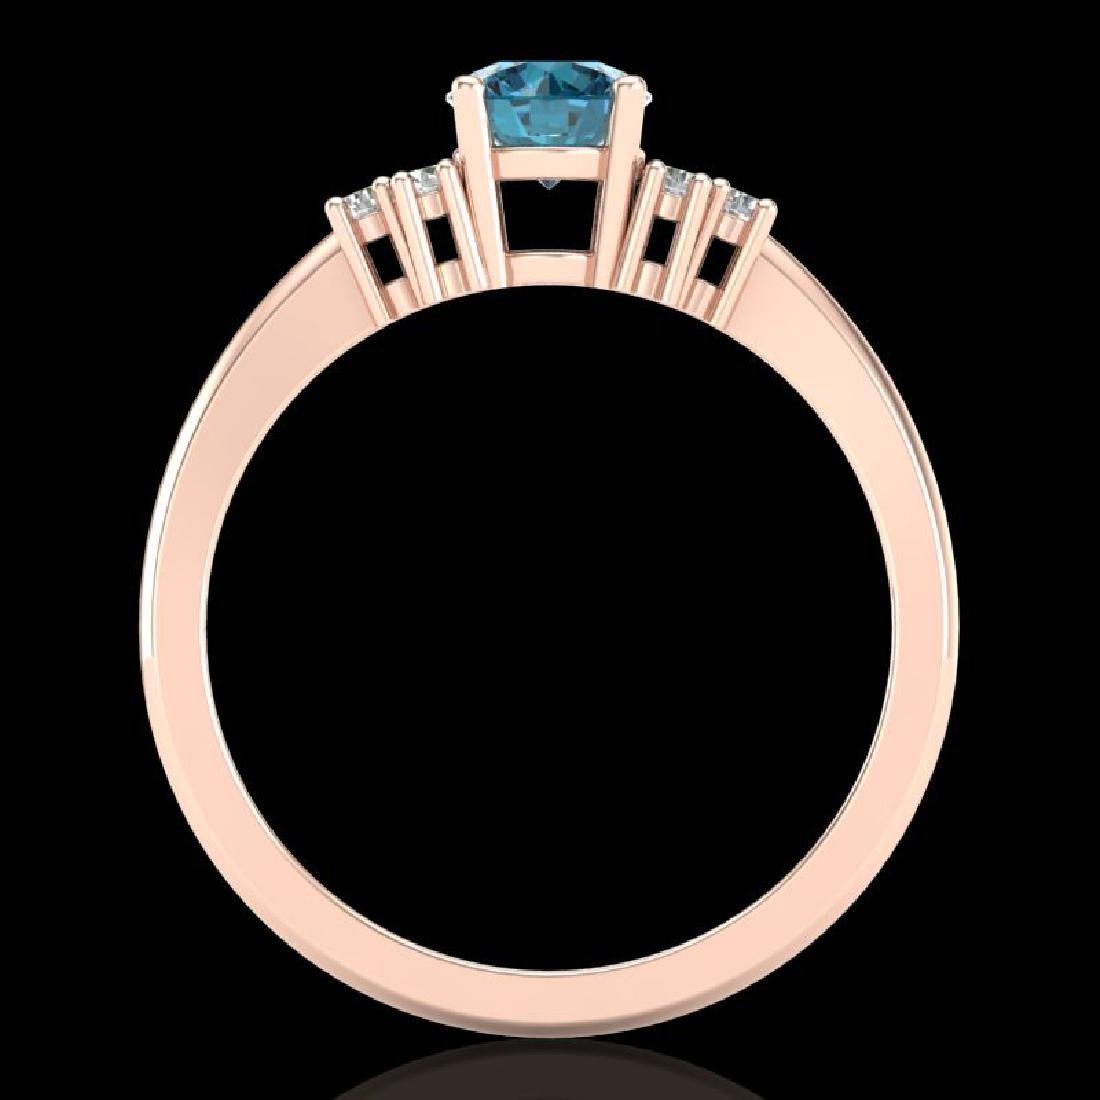 0.75 CTW Fancy Intense Blue Diamond Engagement Classic - 3